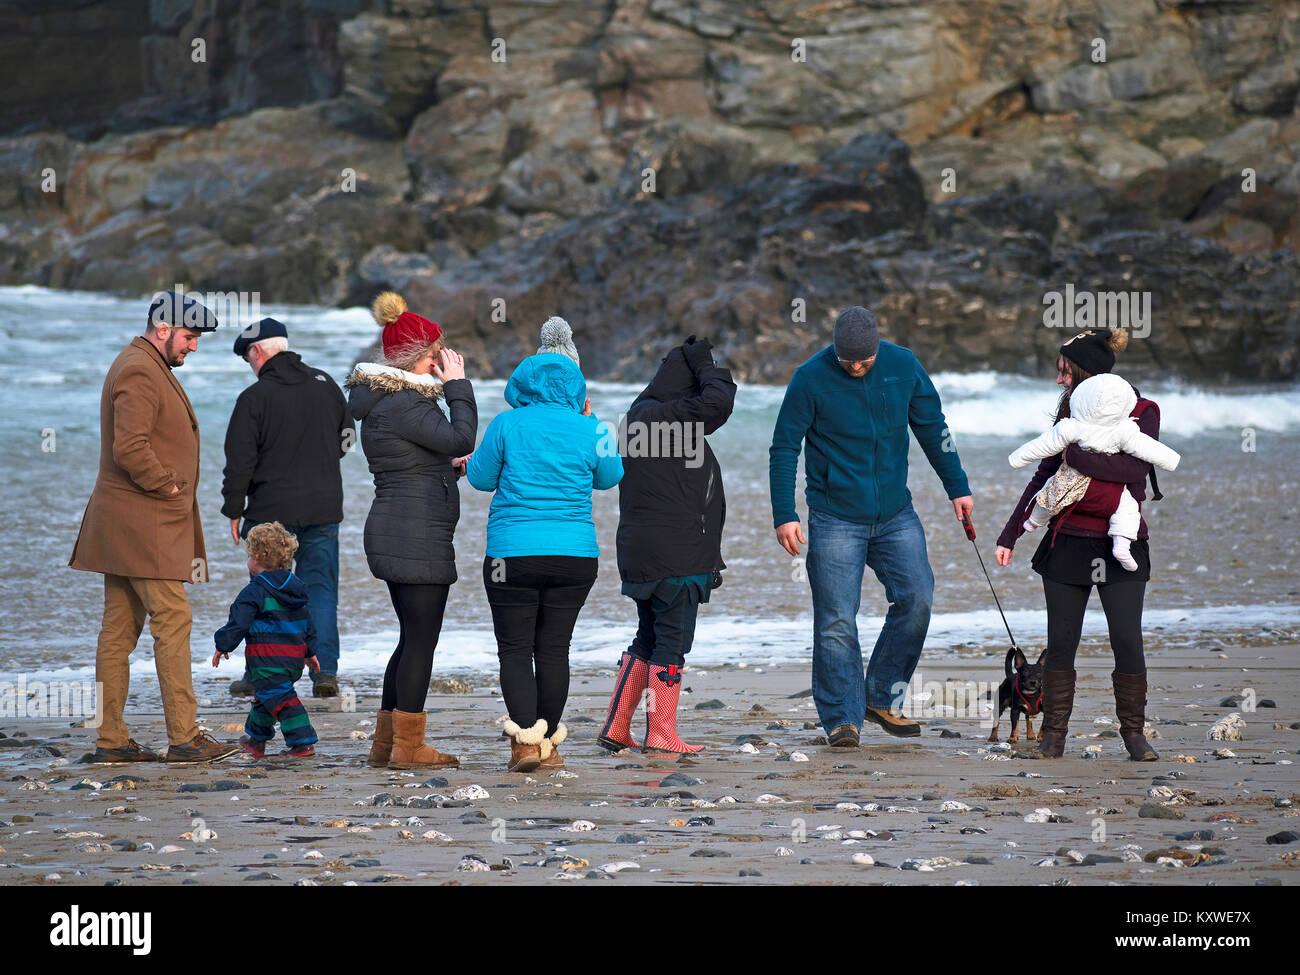 three generations of family having a winter walk on the beach at porthtowan in cornwall, uk. - Stock Image